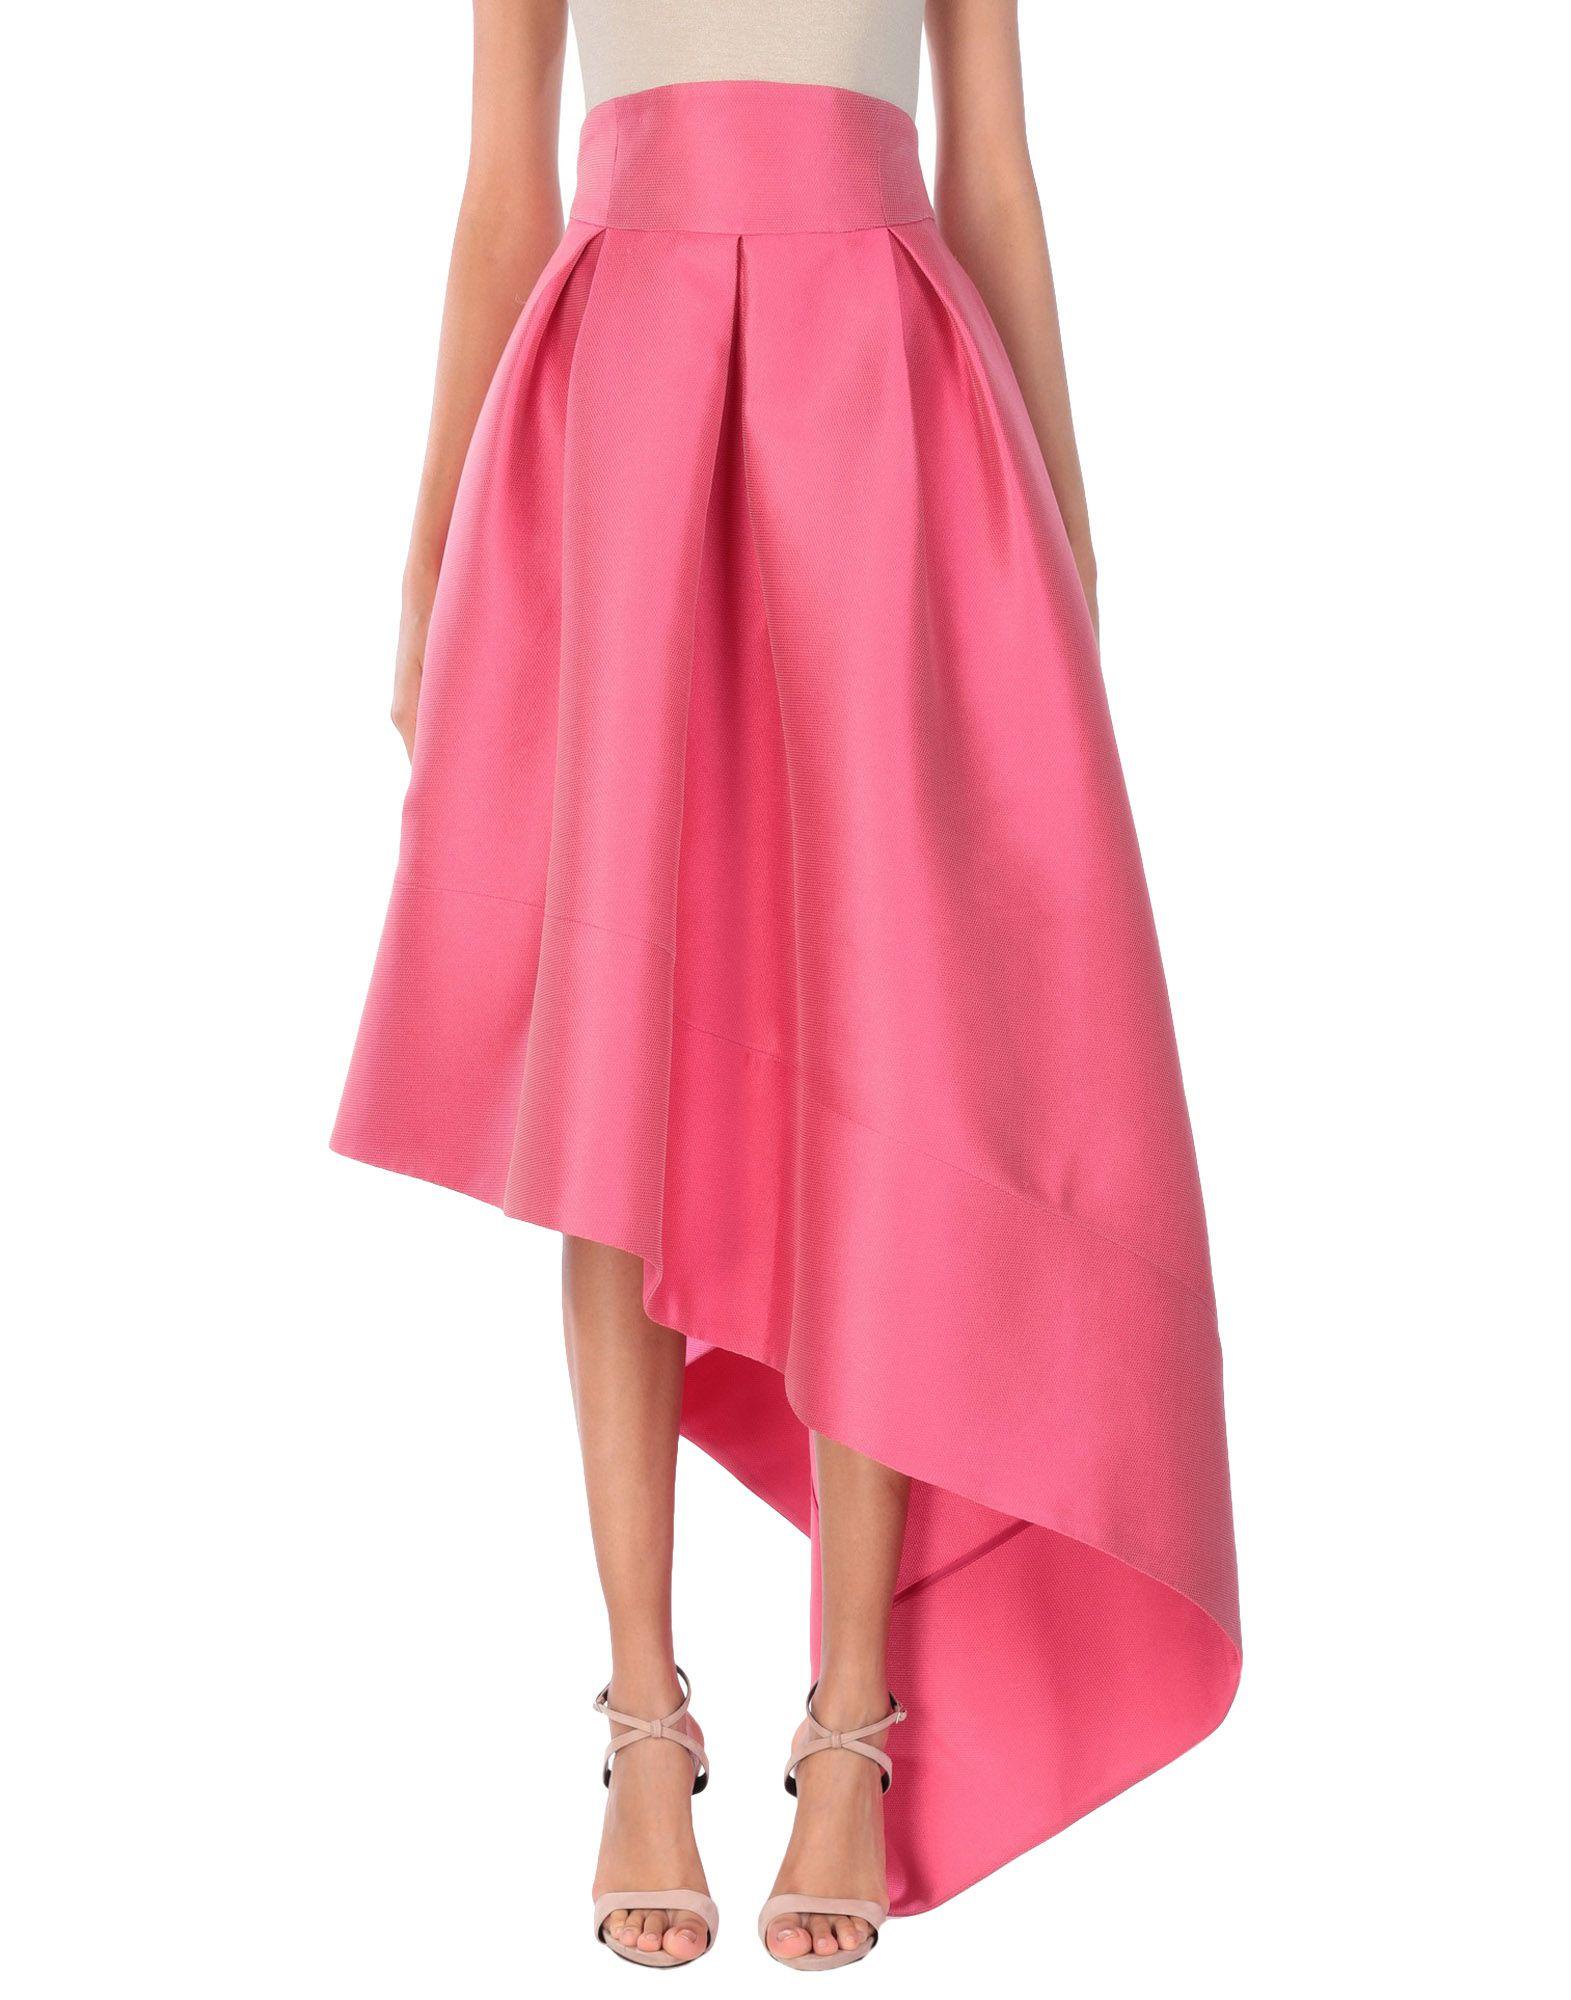 IO COUTURE Юбка длиной 3/4 padì couture юбка длиной 3 4